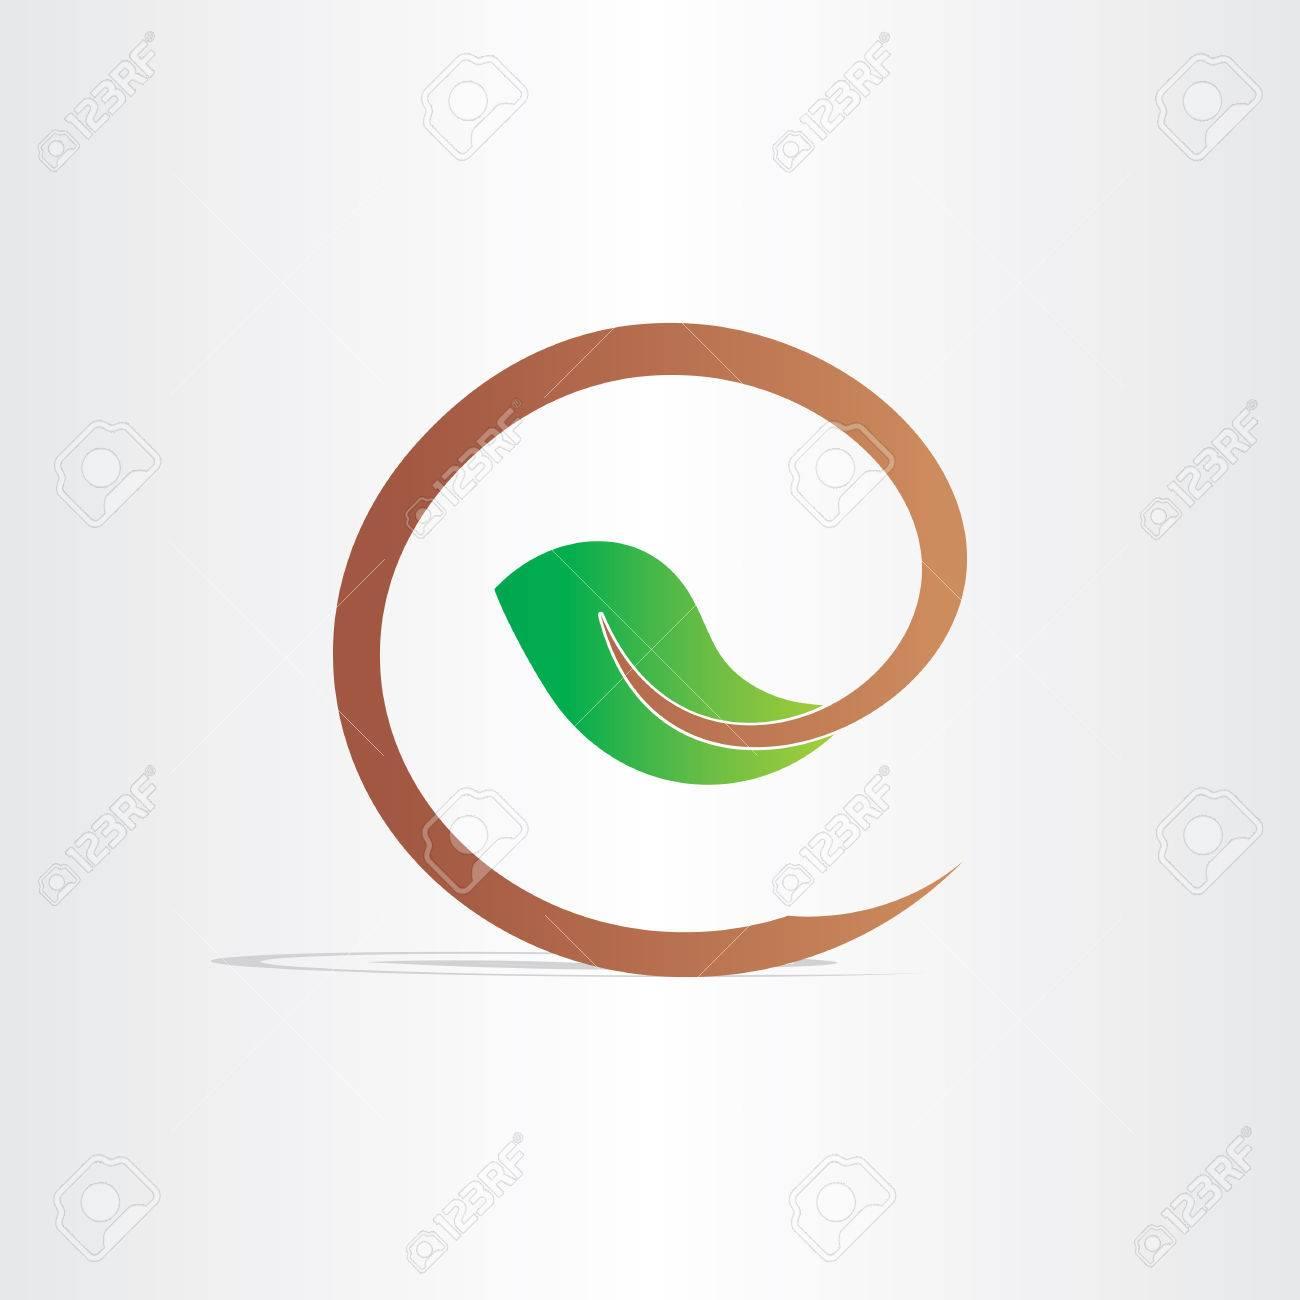 Letter e eco branch with leaf symbol design royalty free cliparts letter e eco branch with leaf symbol design stock vector 40569151 biocorpaavc Gallery